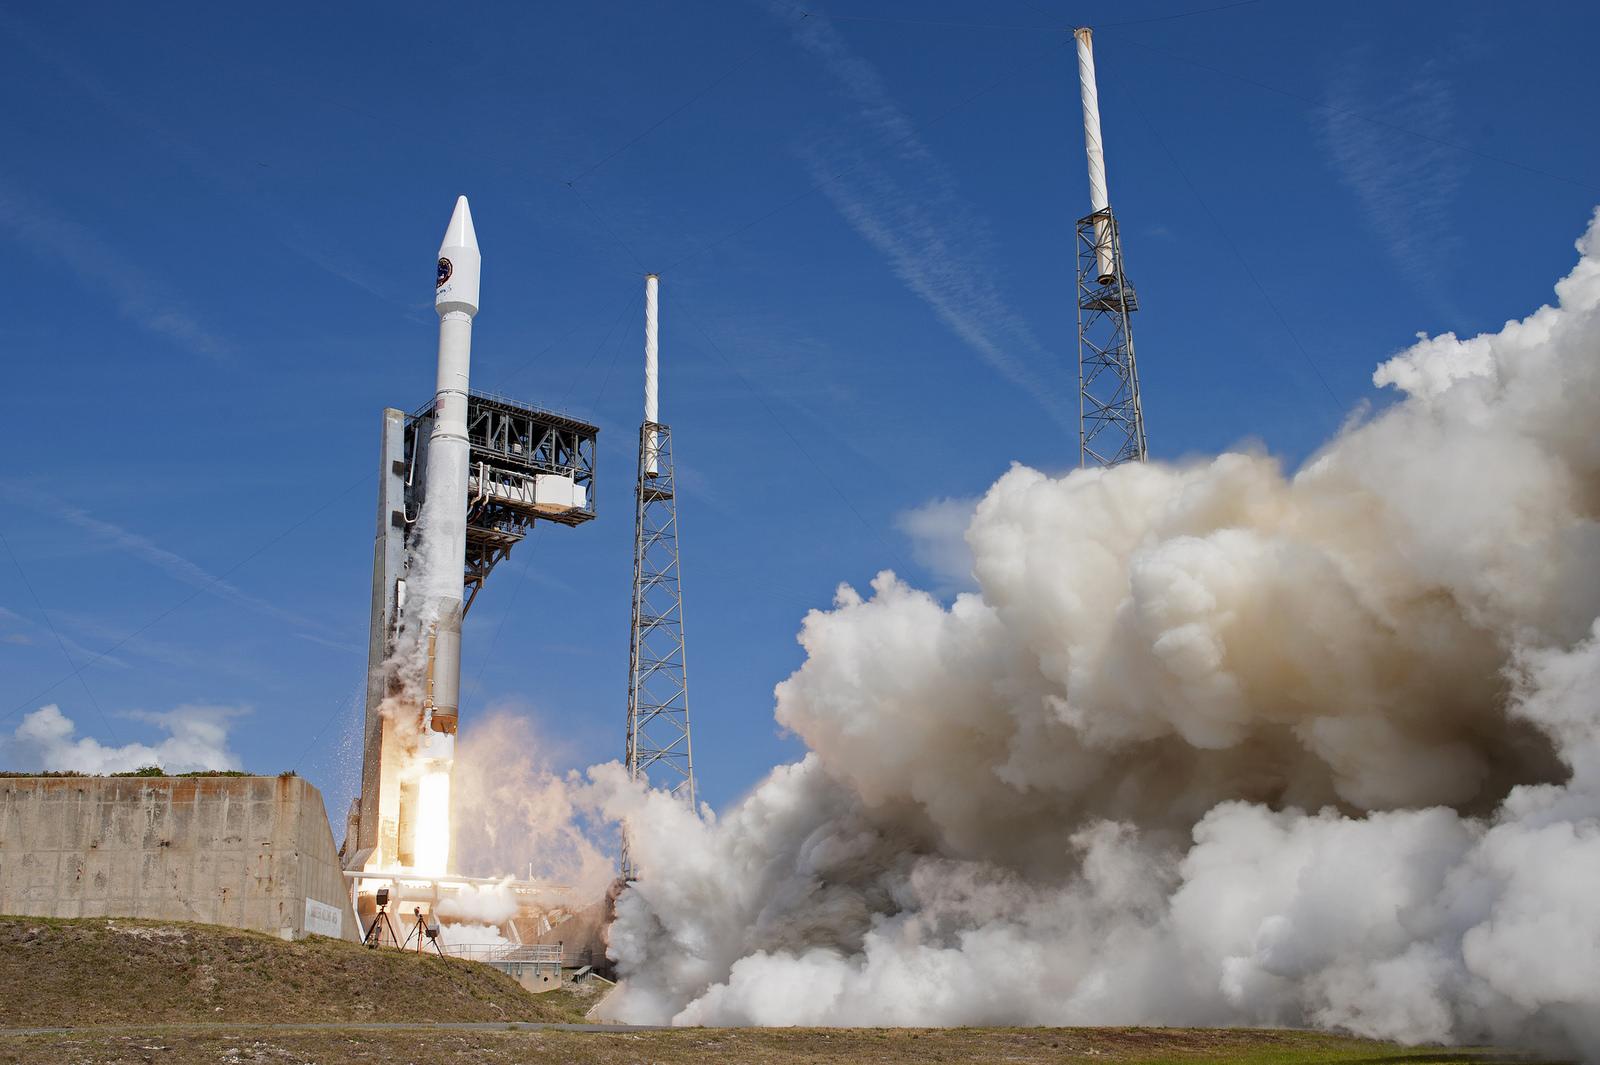 orbital atk crs 7 mission begins kennedy space center orbital atk crs 7 mission begins